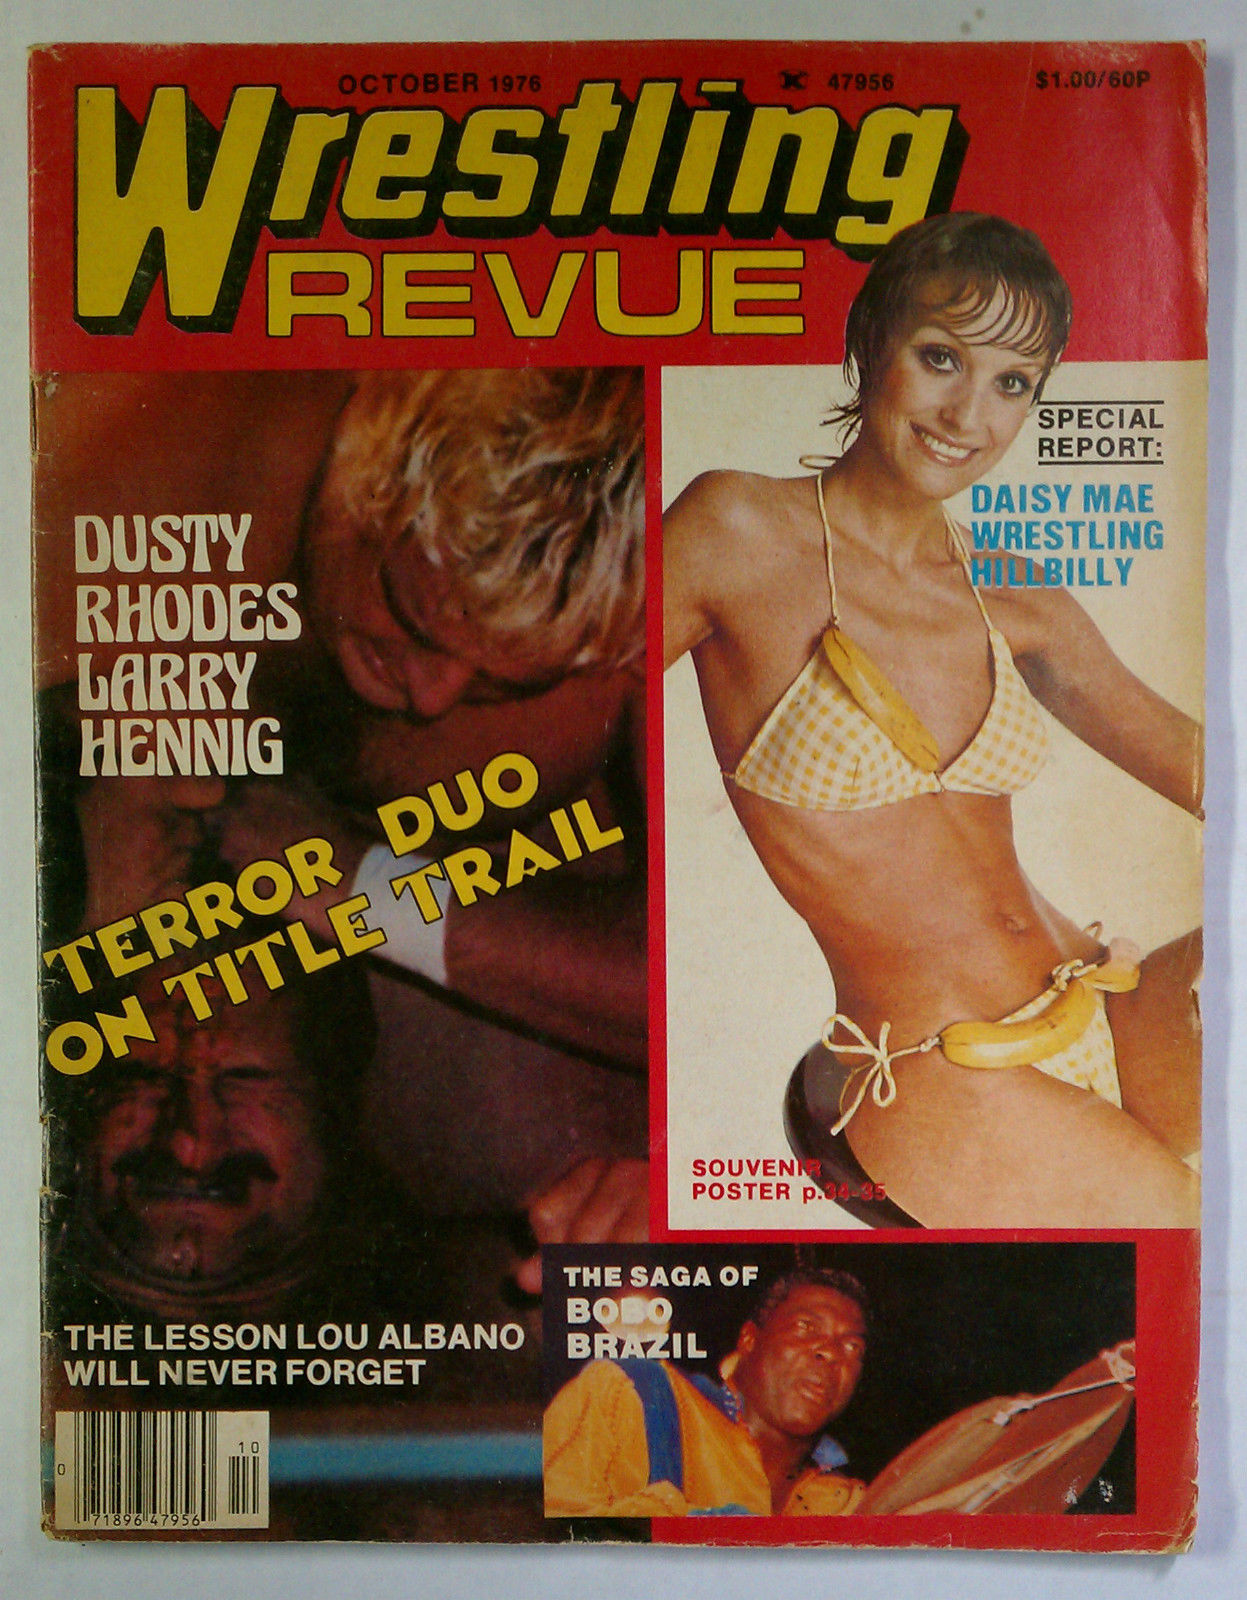 Wrestling Revue - October 1976